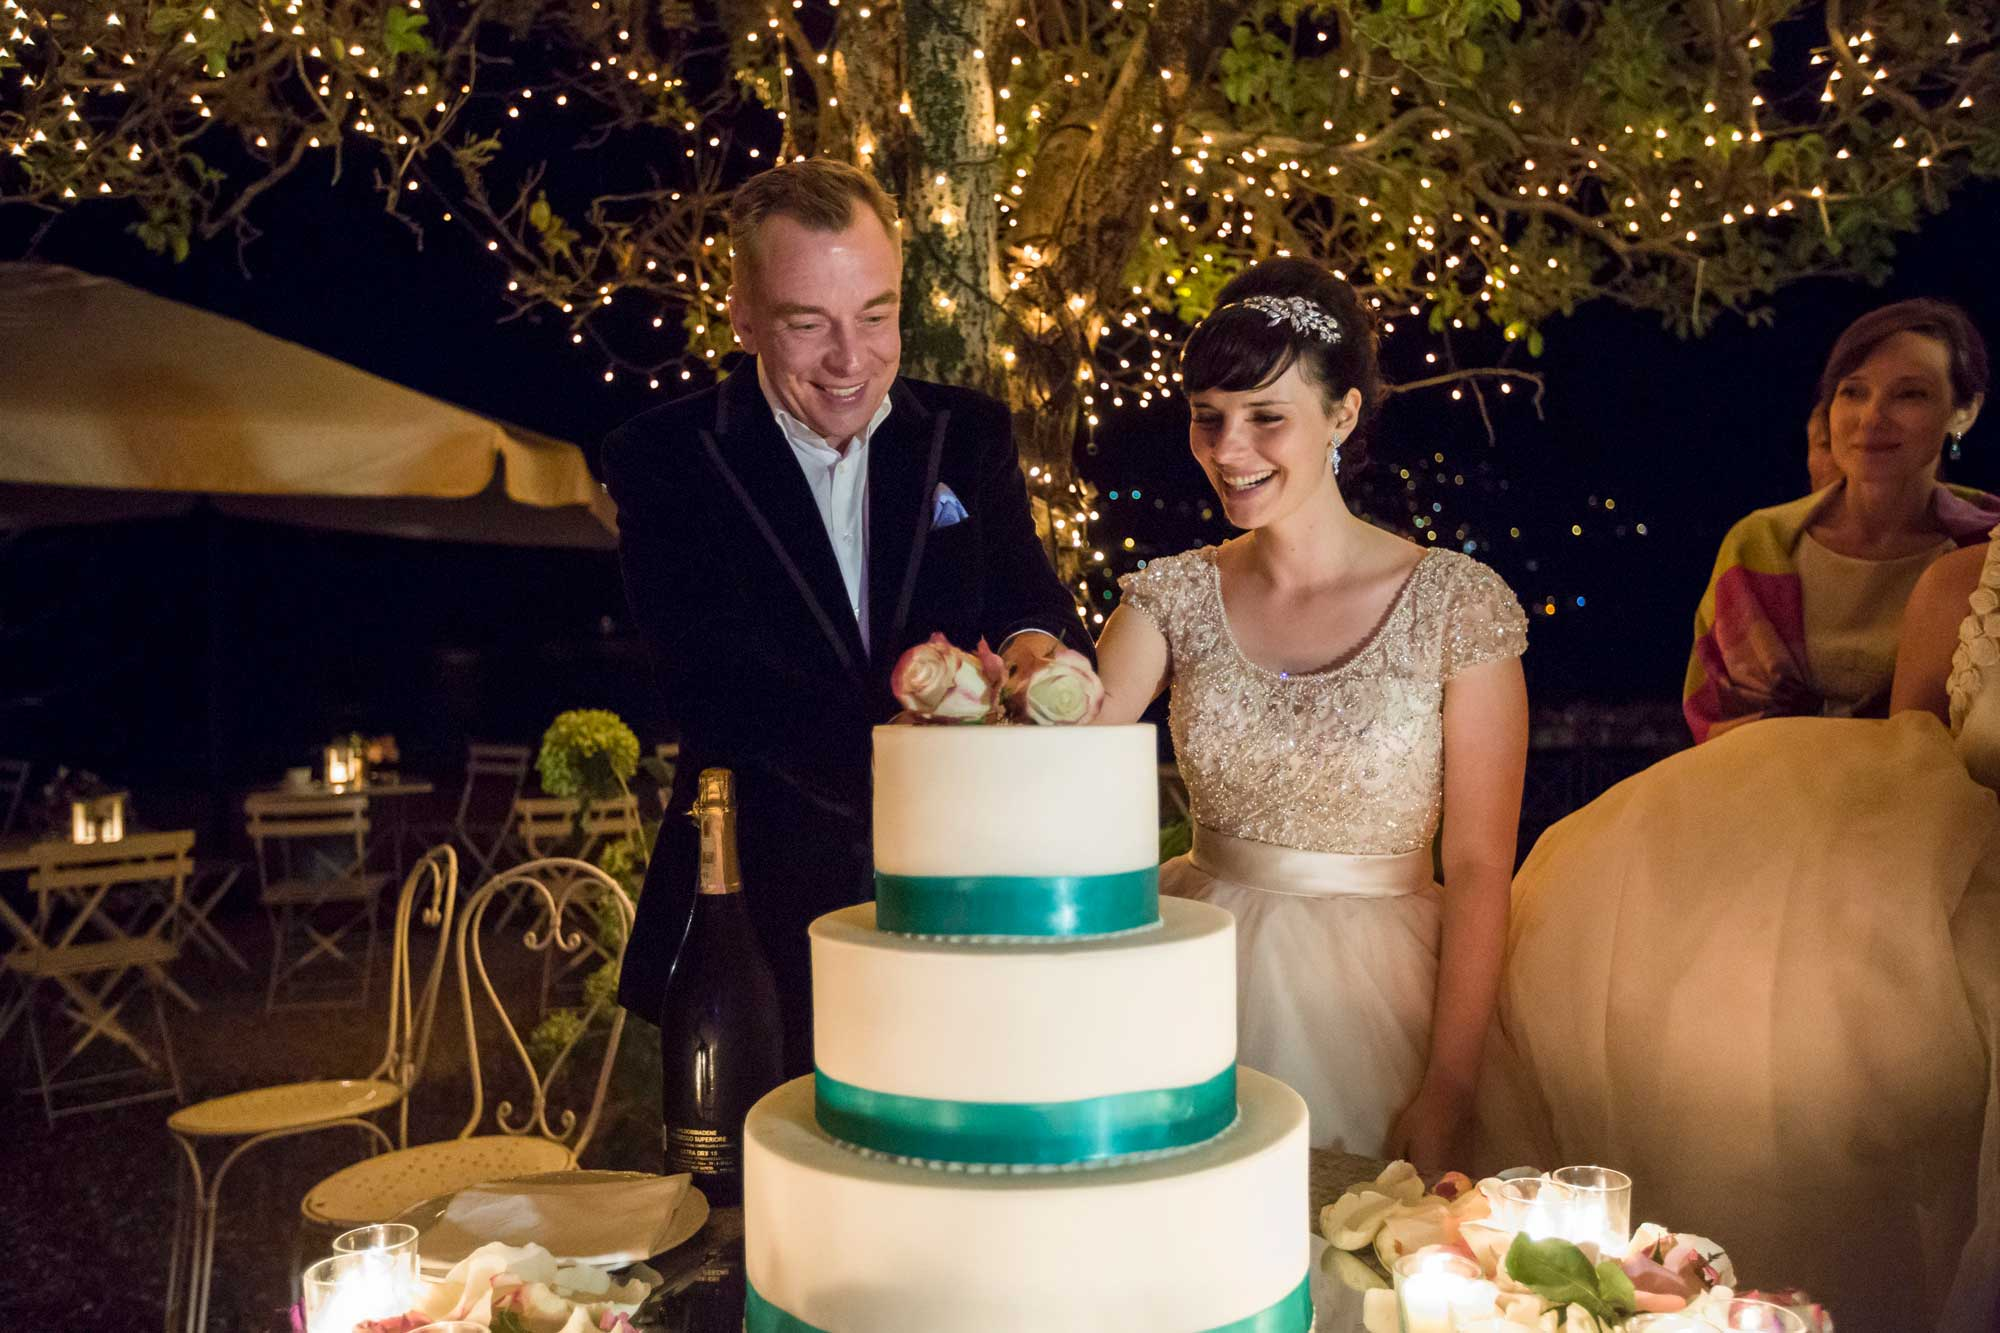 Wedding of Natalia and Alexan-Der